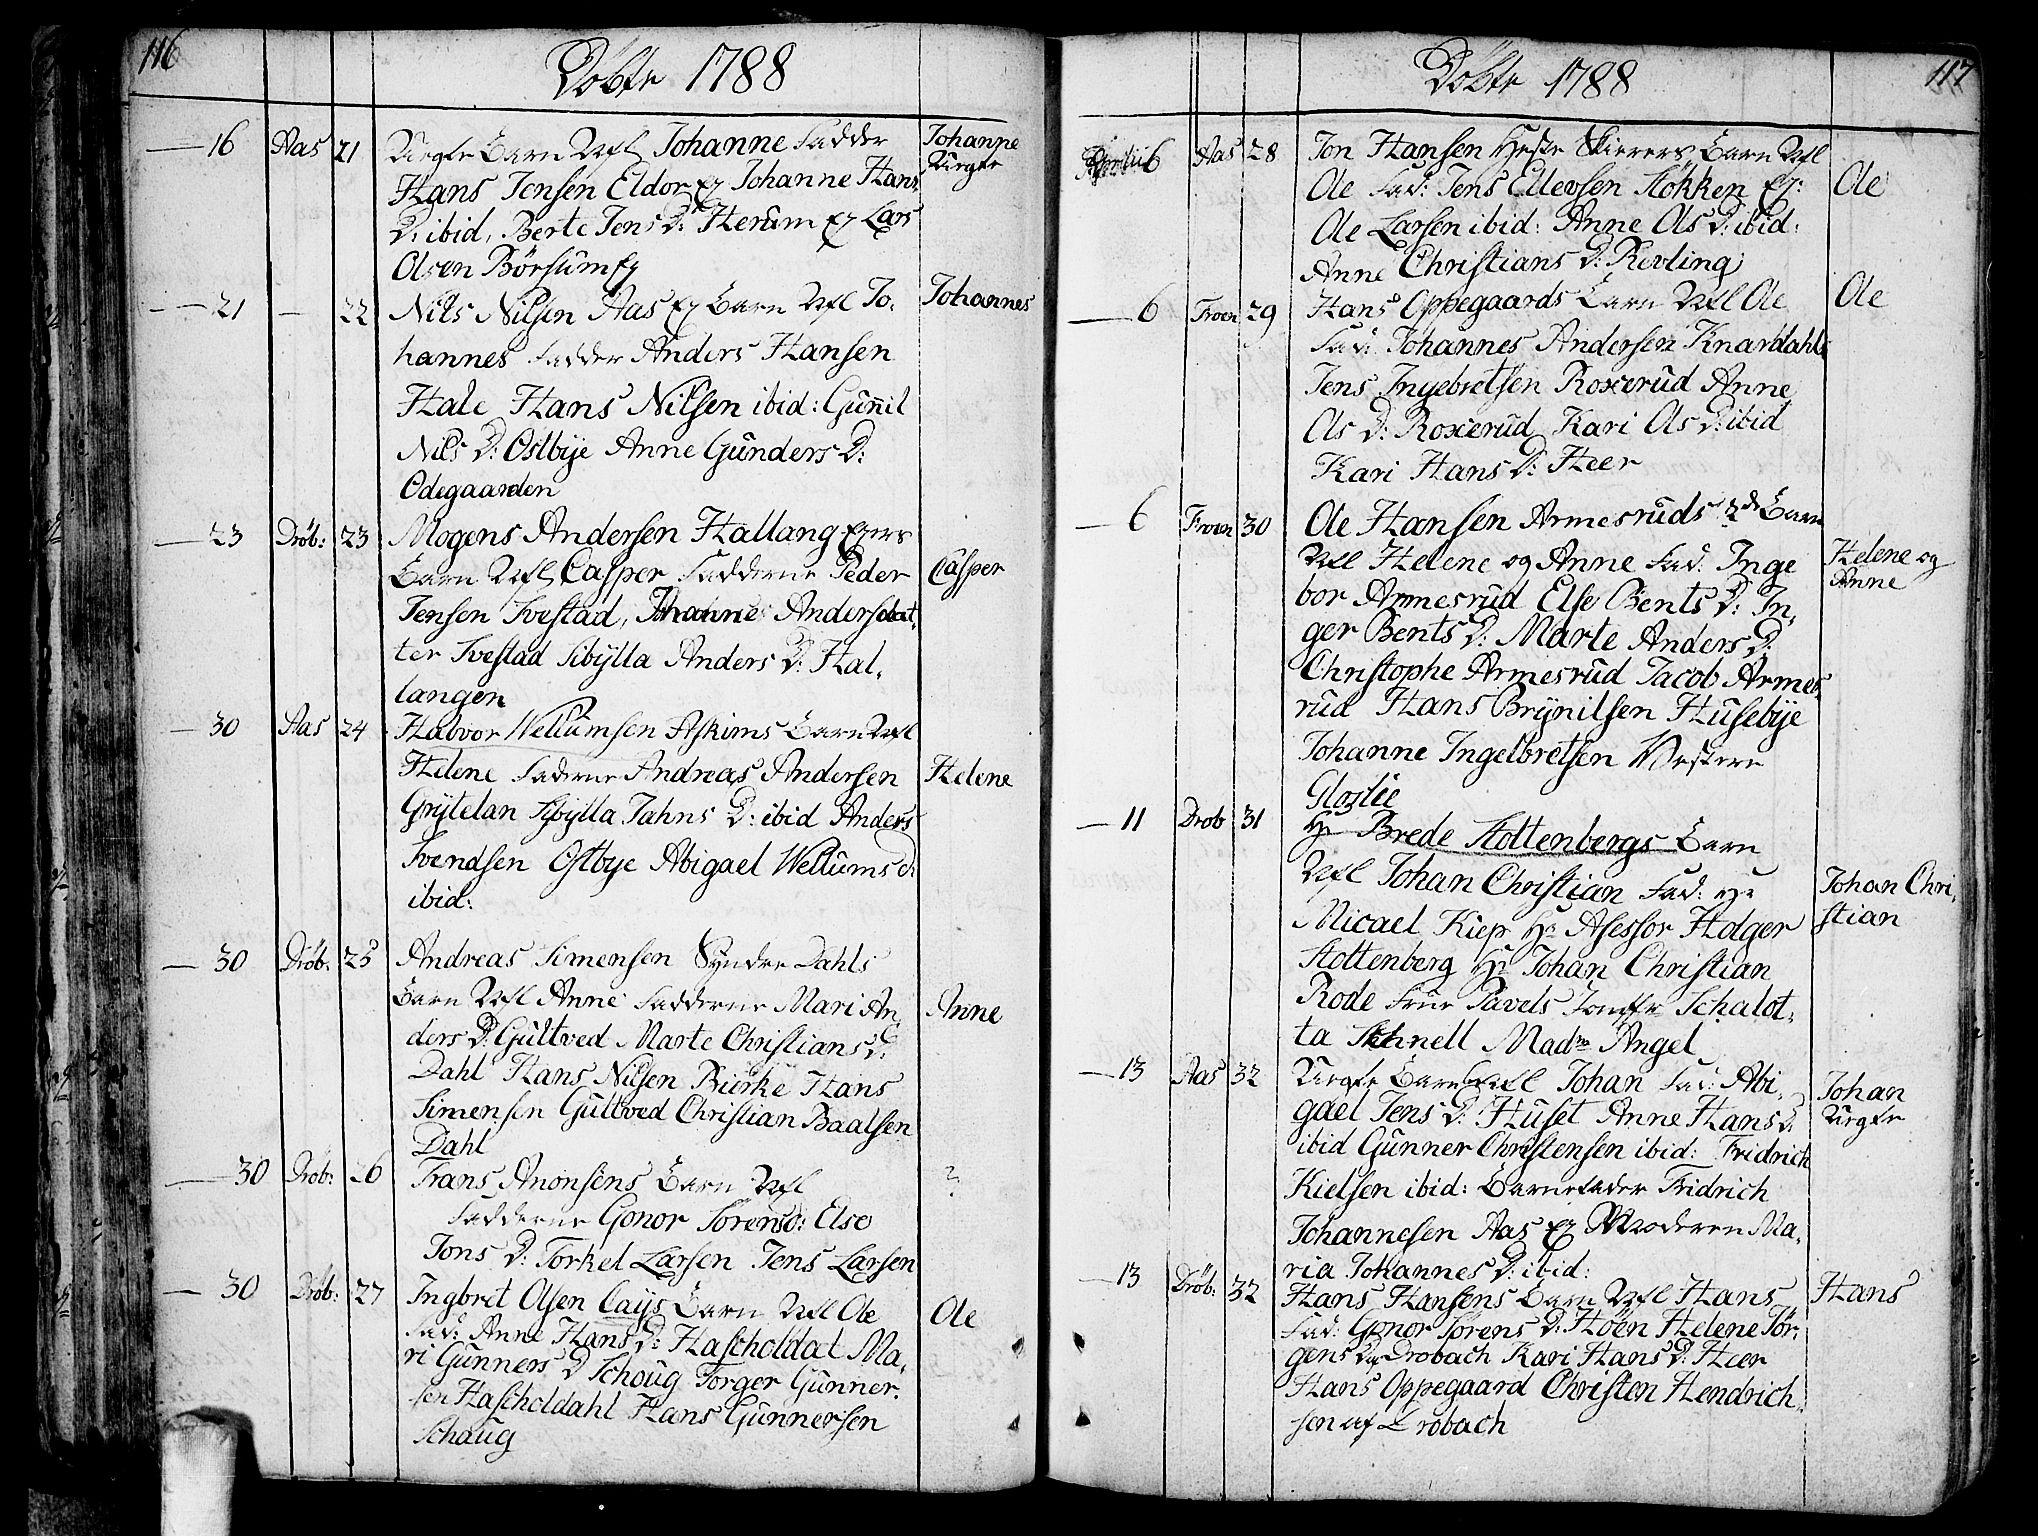 SAO, Ås prestekontor Kirkebøker, F/Fa/L0002: Ministerialbok nr. I 2, 1778-1813, s. 116-117